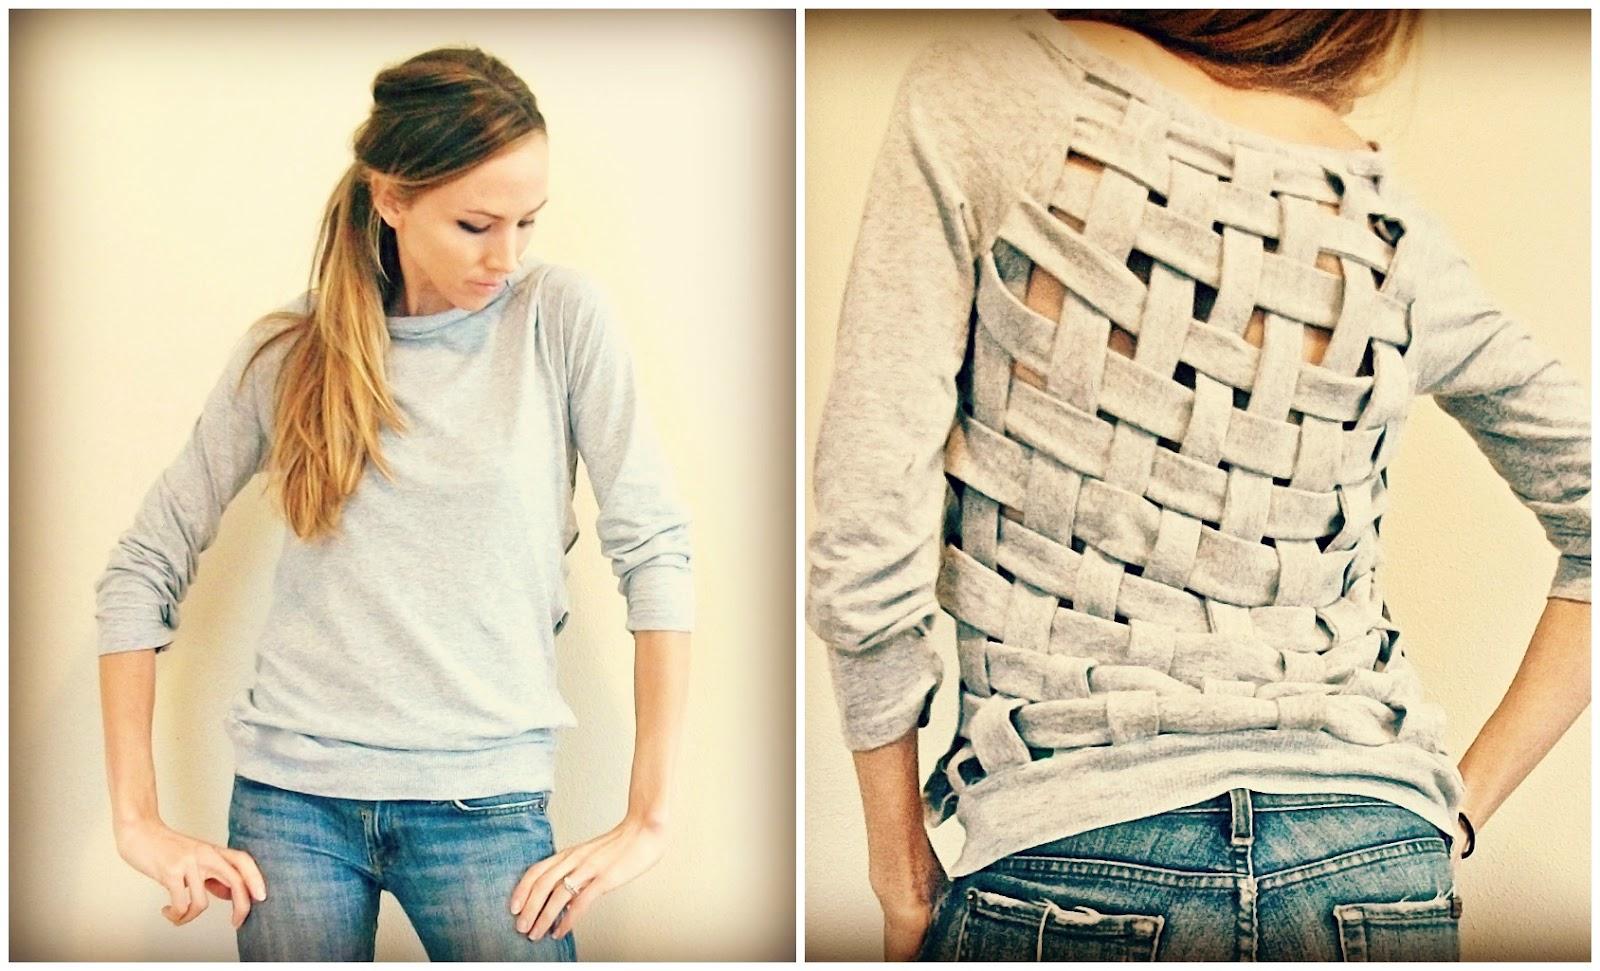 diy fashion basket weave shirt mz mahogany chicmz. Black Bedroom Furniture Sets. Home Design Ideas